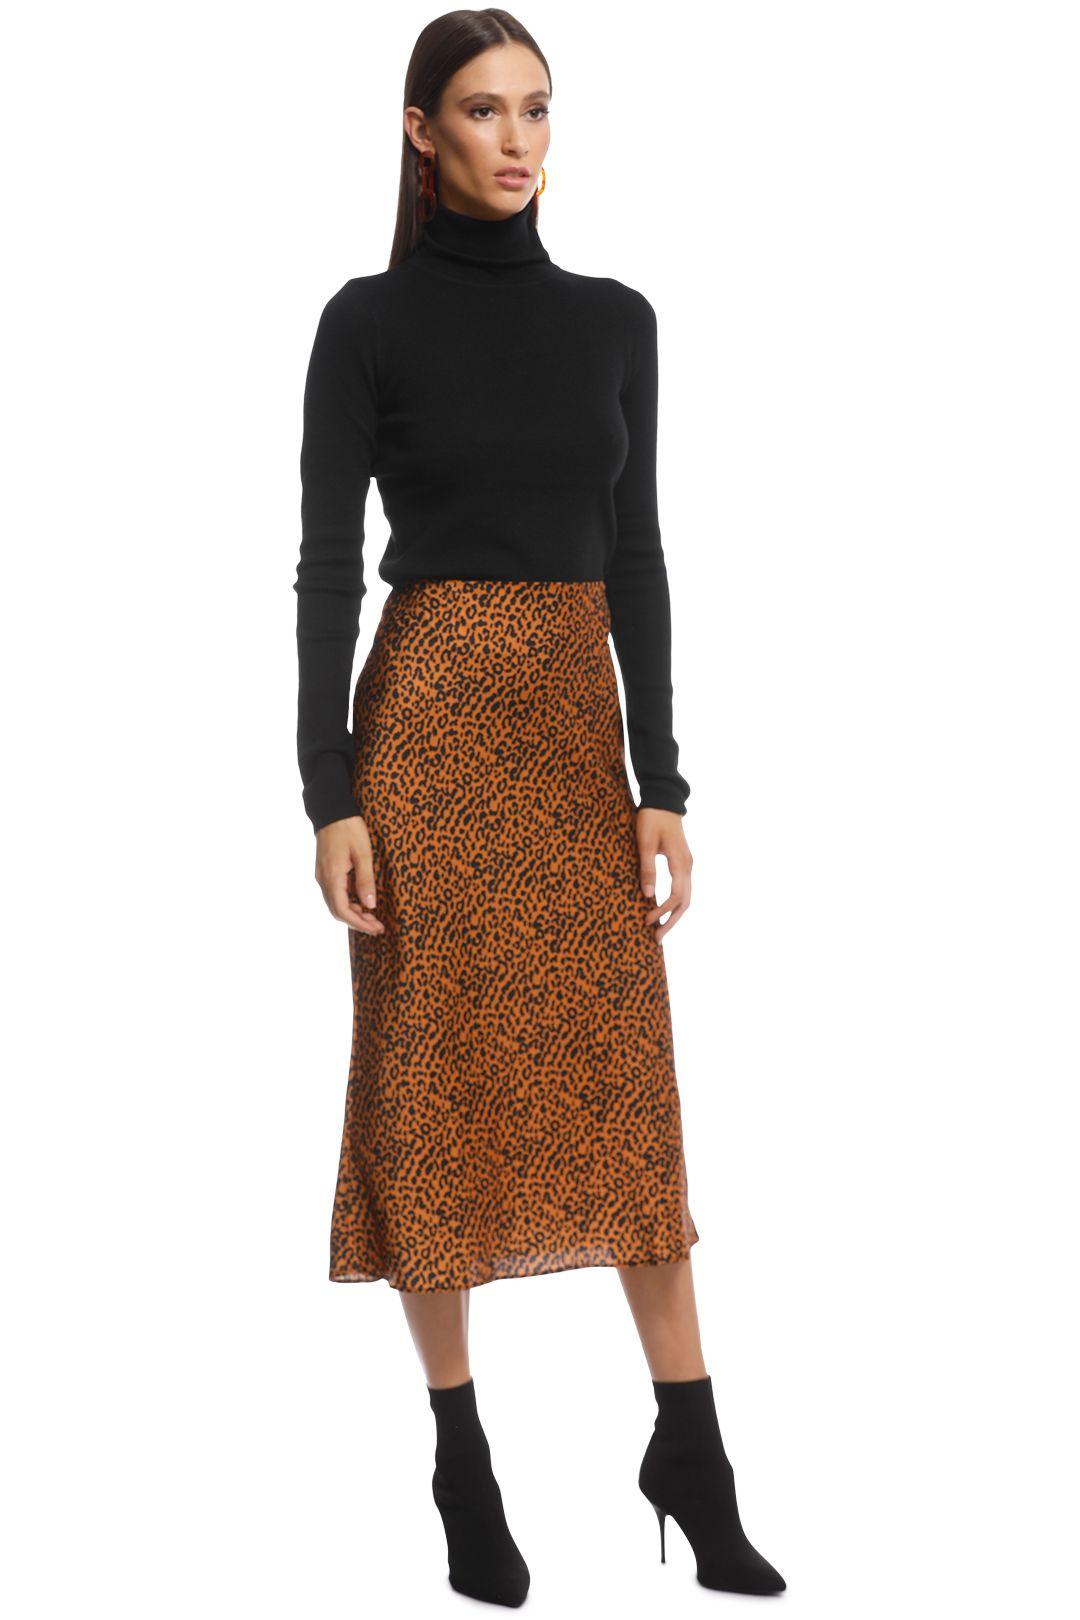 The East Order - Sahara Midi Skirt - Animal - Side